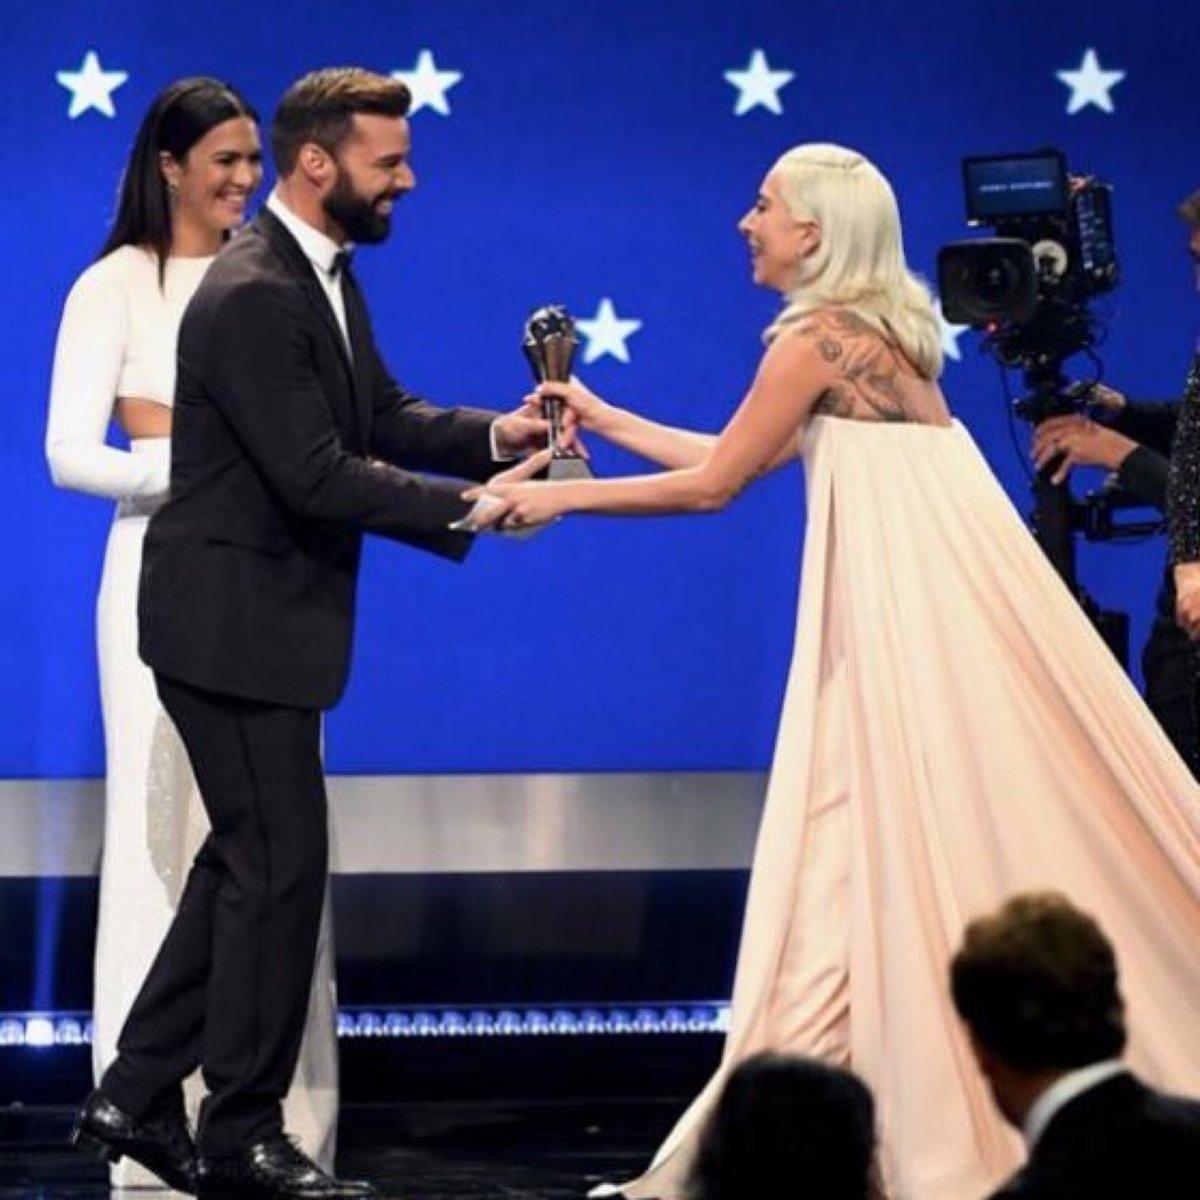 Well deserved @ladygaga. Such a stunning performance #BRAVA ???????????????????????? #AStarIsBorn #Shallow https://t.co/Z4PKf7LH0v